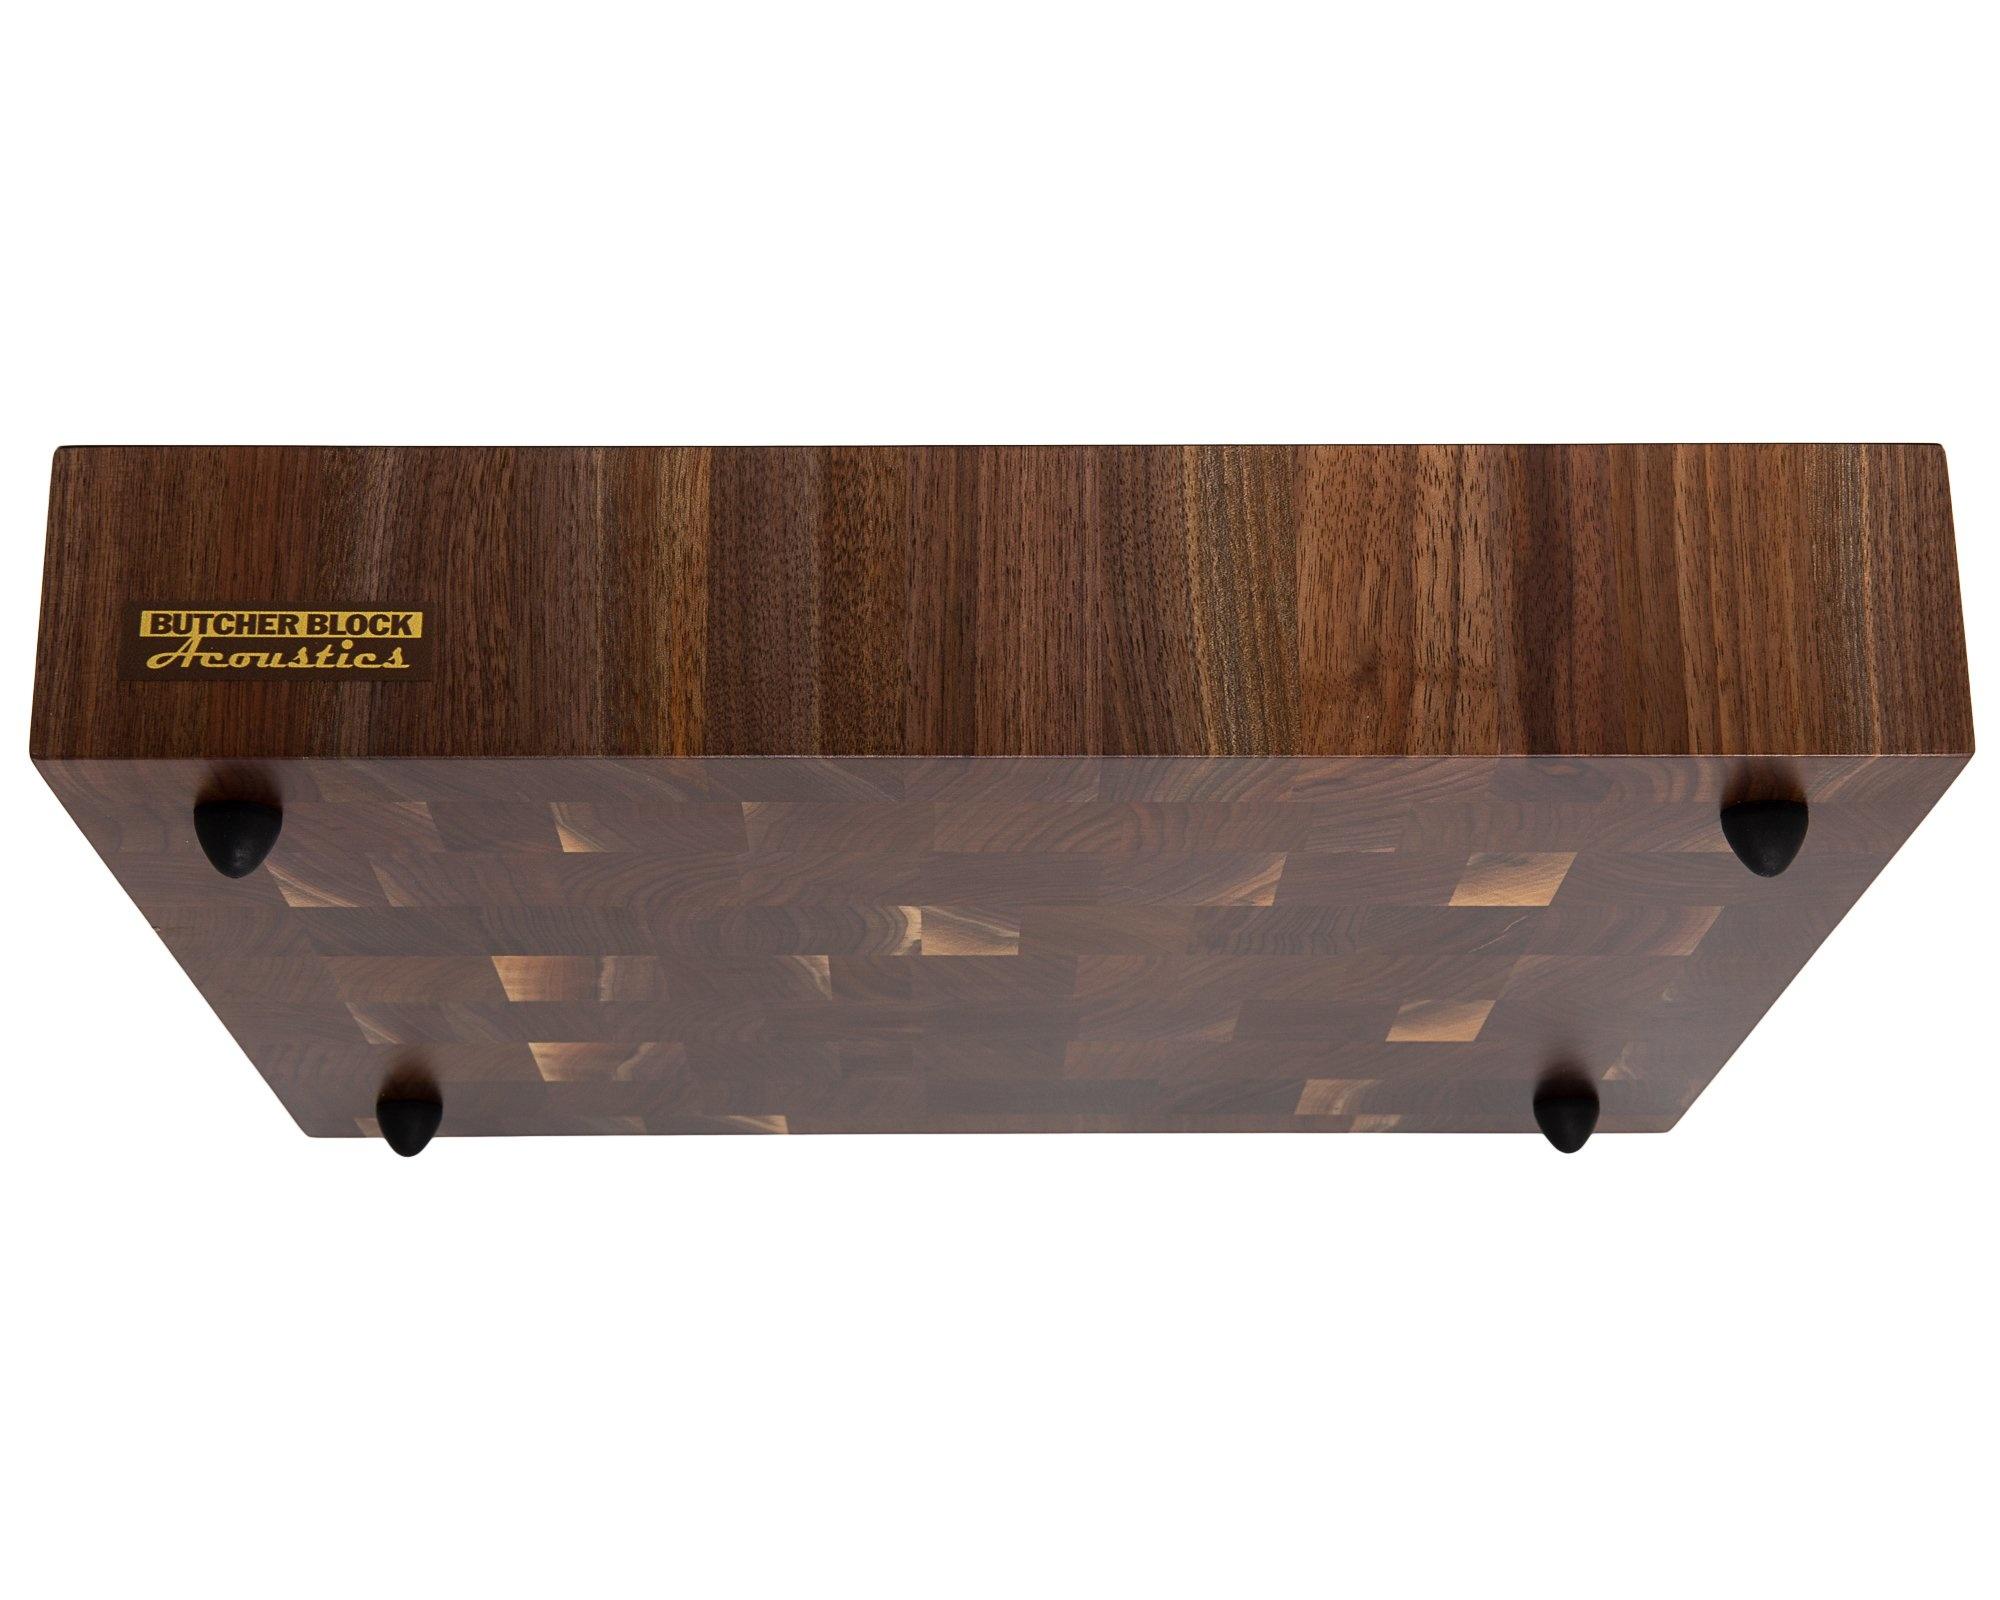 "Butcher Block Acoustics Walnut End-Grain Platform ( 3"" )"